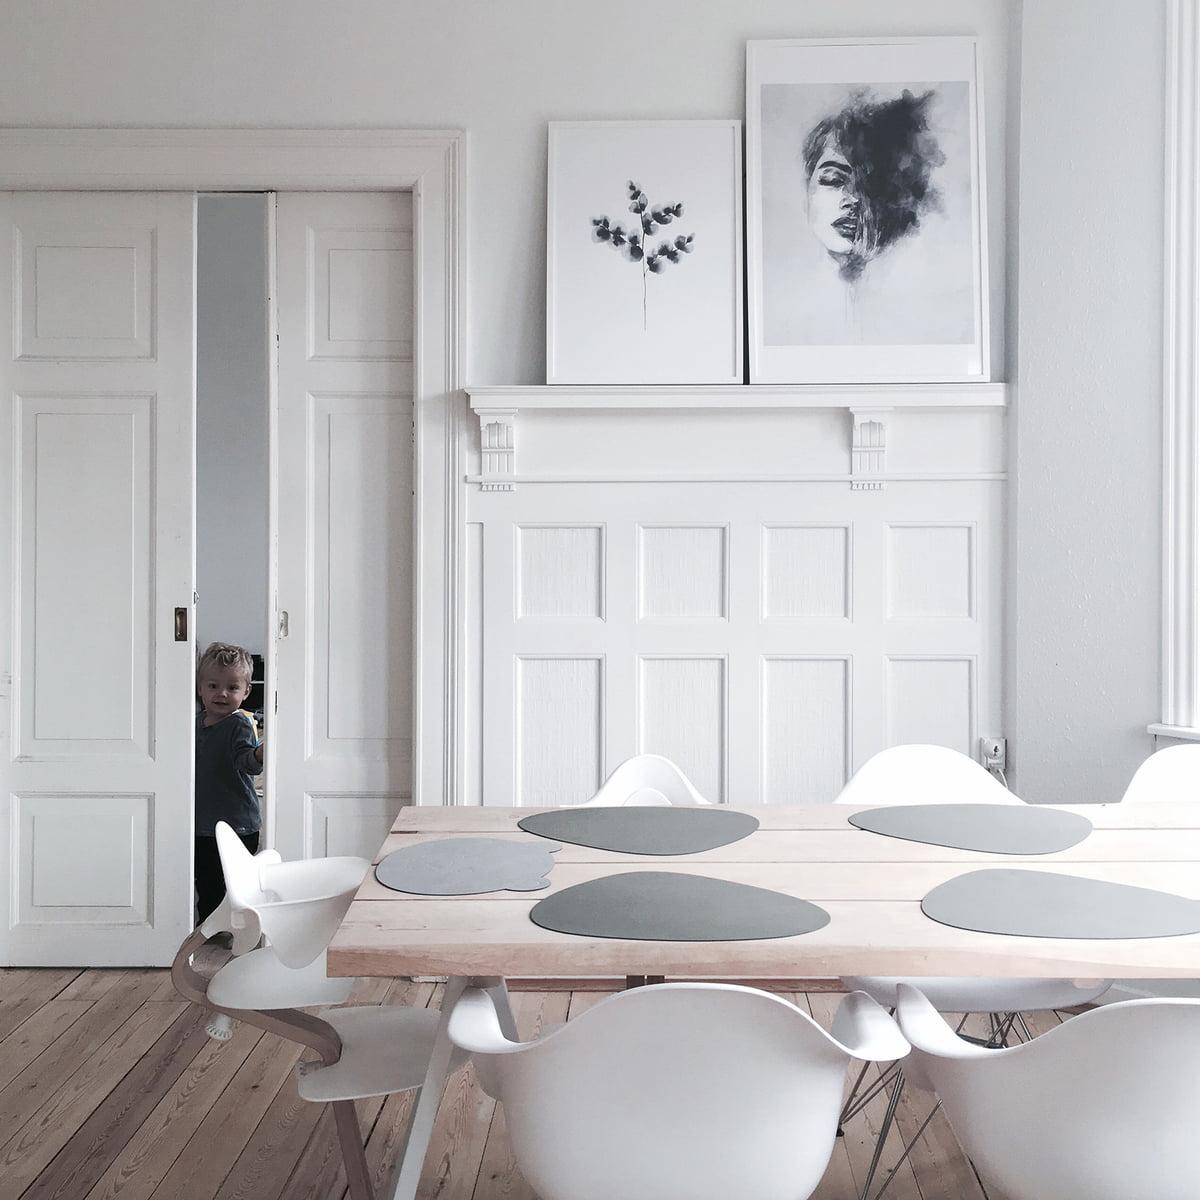 wolken platzset f r kinder von linddna. Black Bedroom Furniture Sets. Home Design Ideas